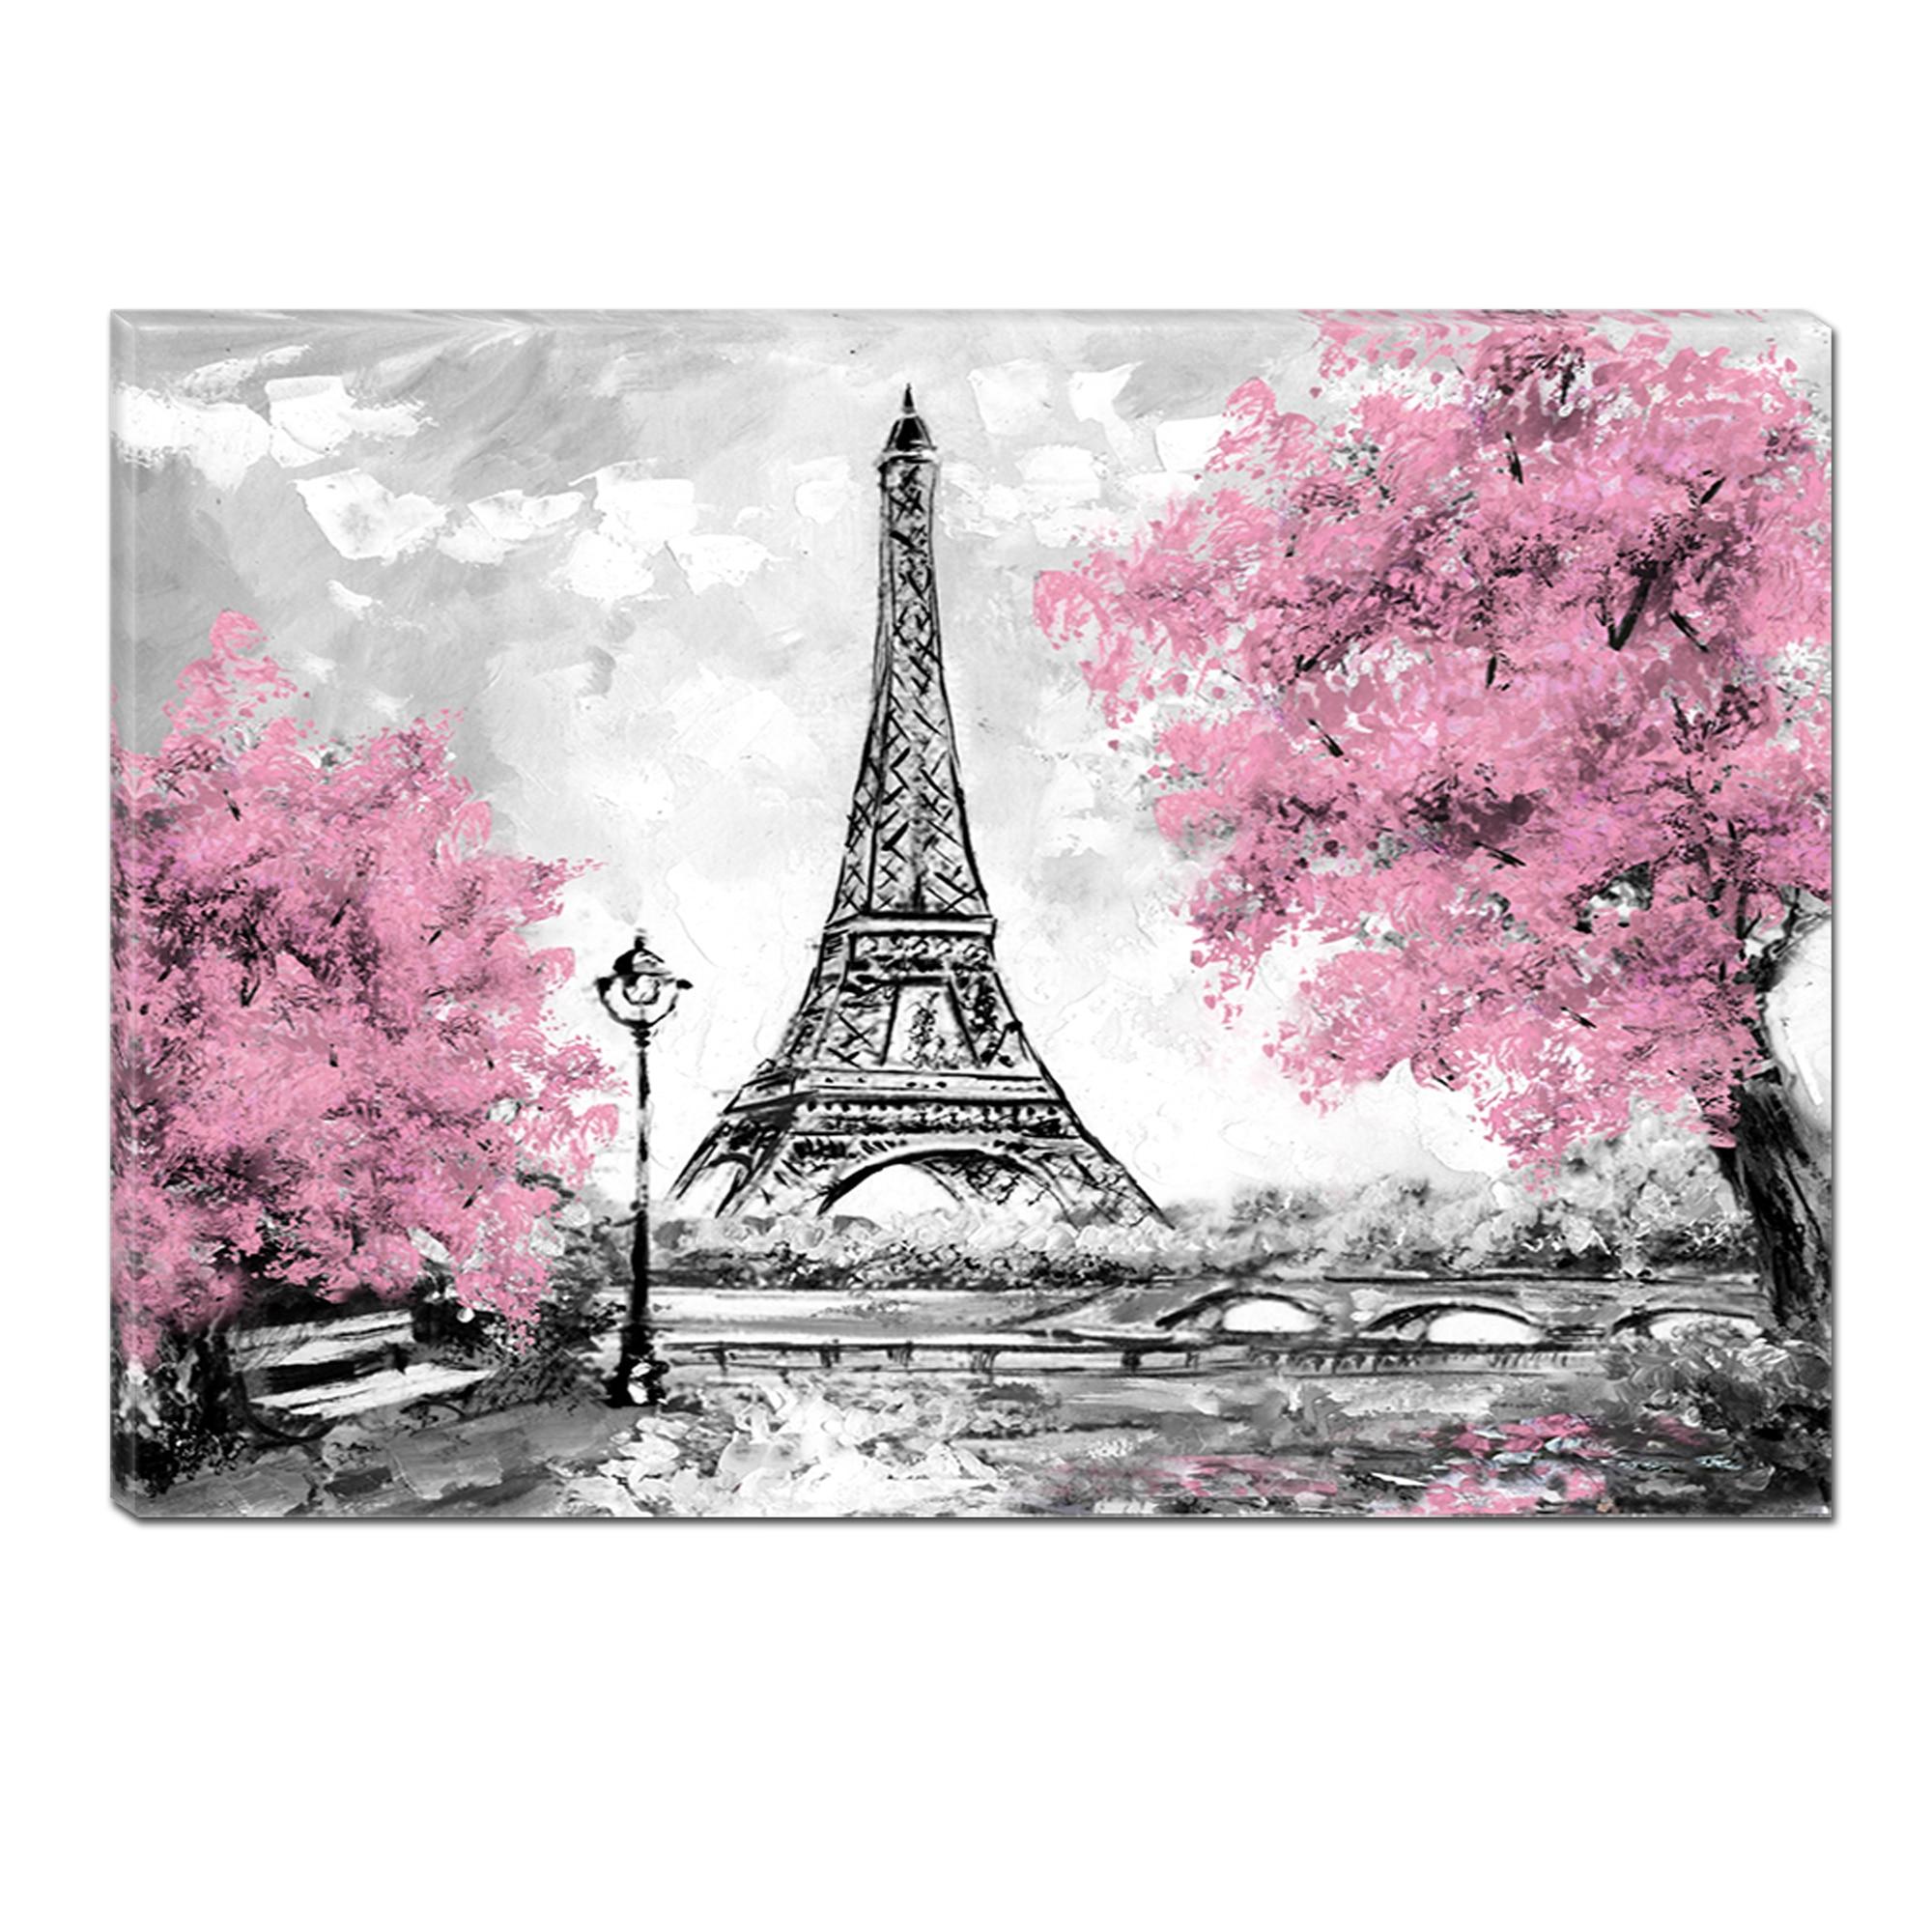 Fotografie Tablou DualView Startonight Parisul Roz, Abstract, Luminos in intuneric, 70 x 100 cm